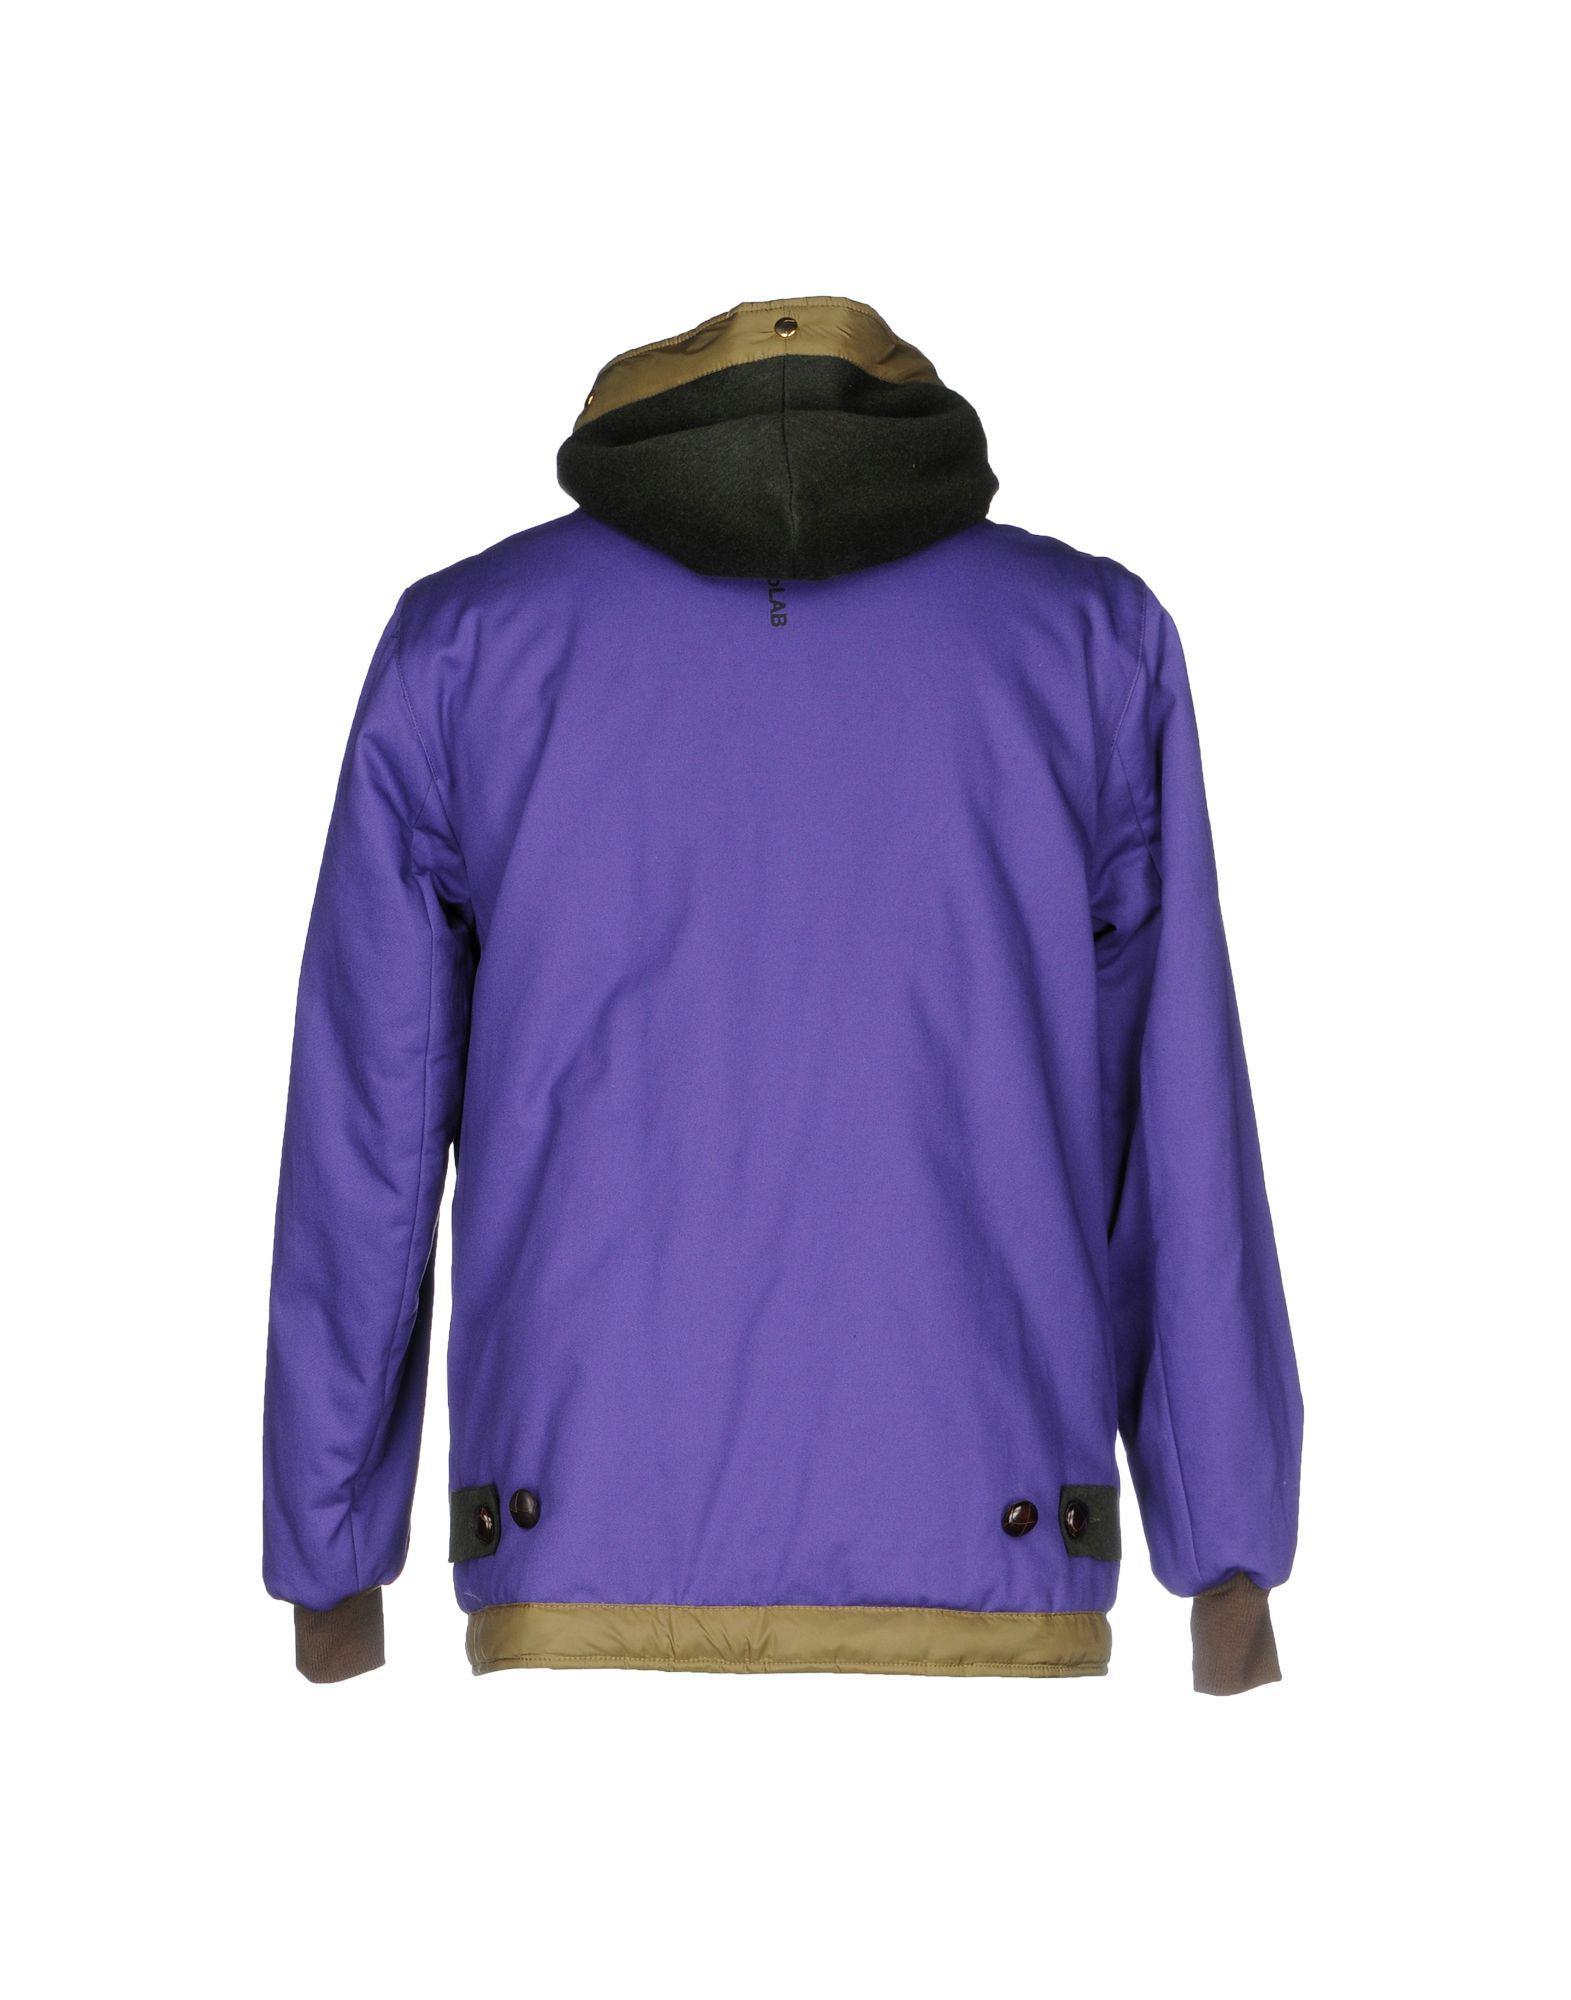 Equipe 70 Cotton Jacket in Purple for Men